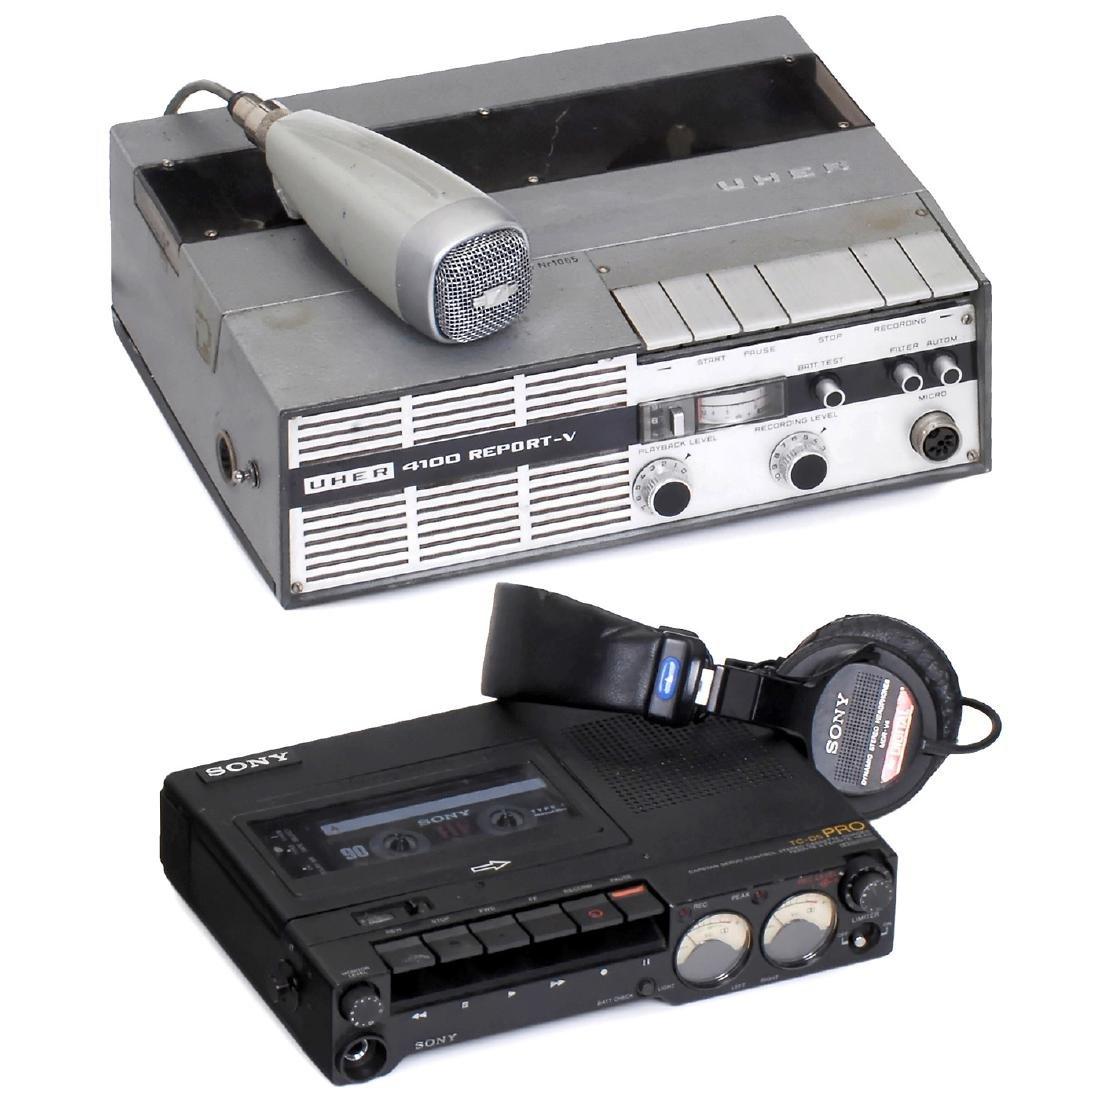 2 Professional Tape Recorders, c. 1980